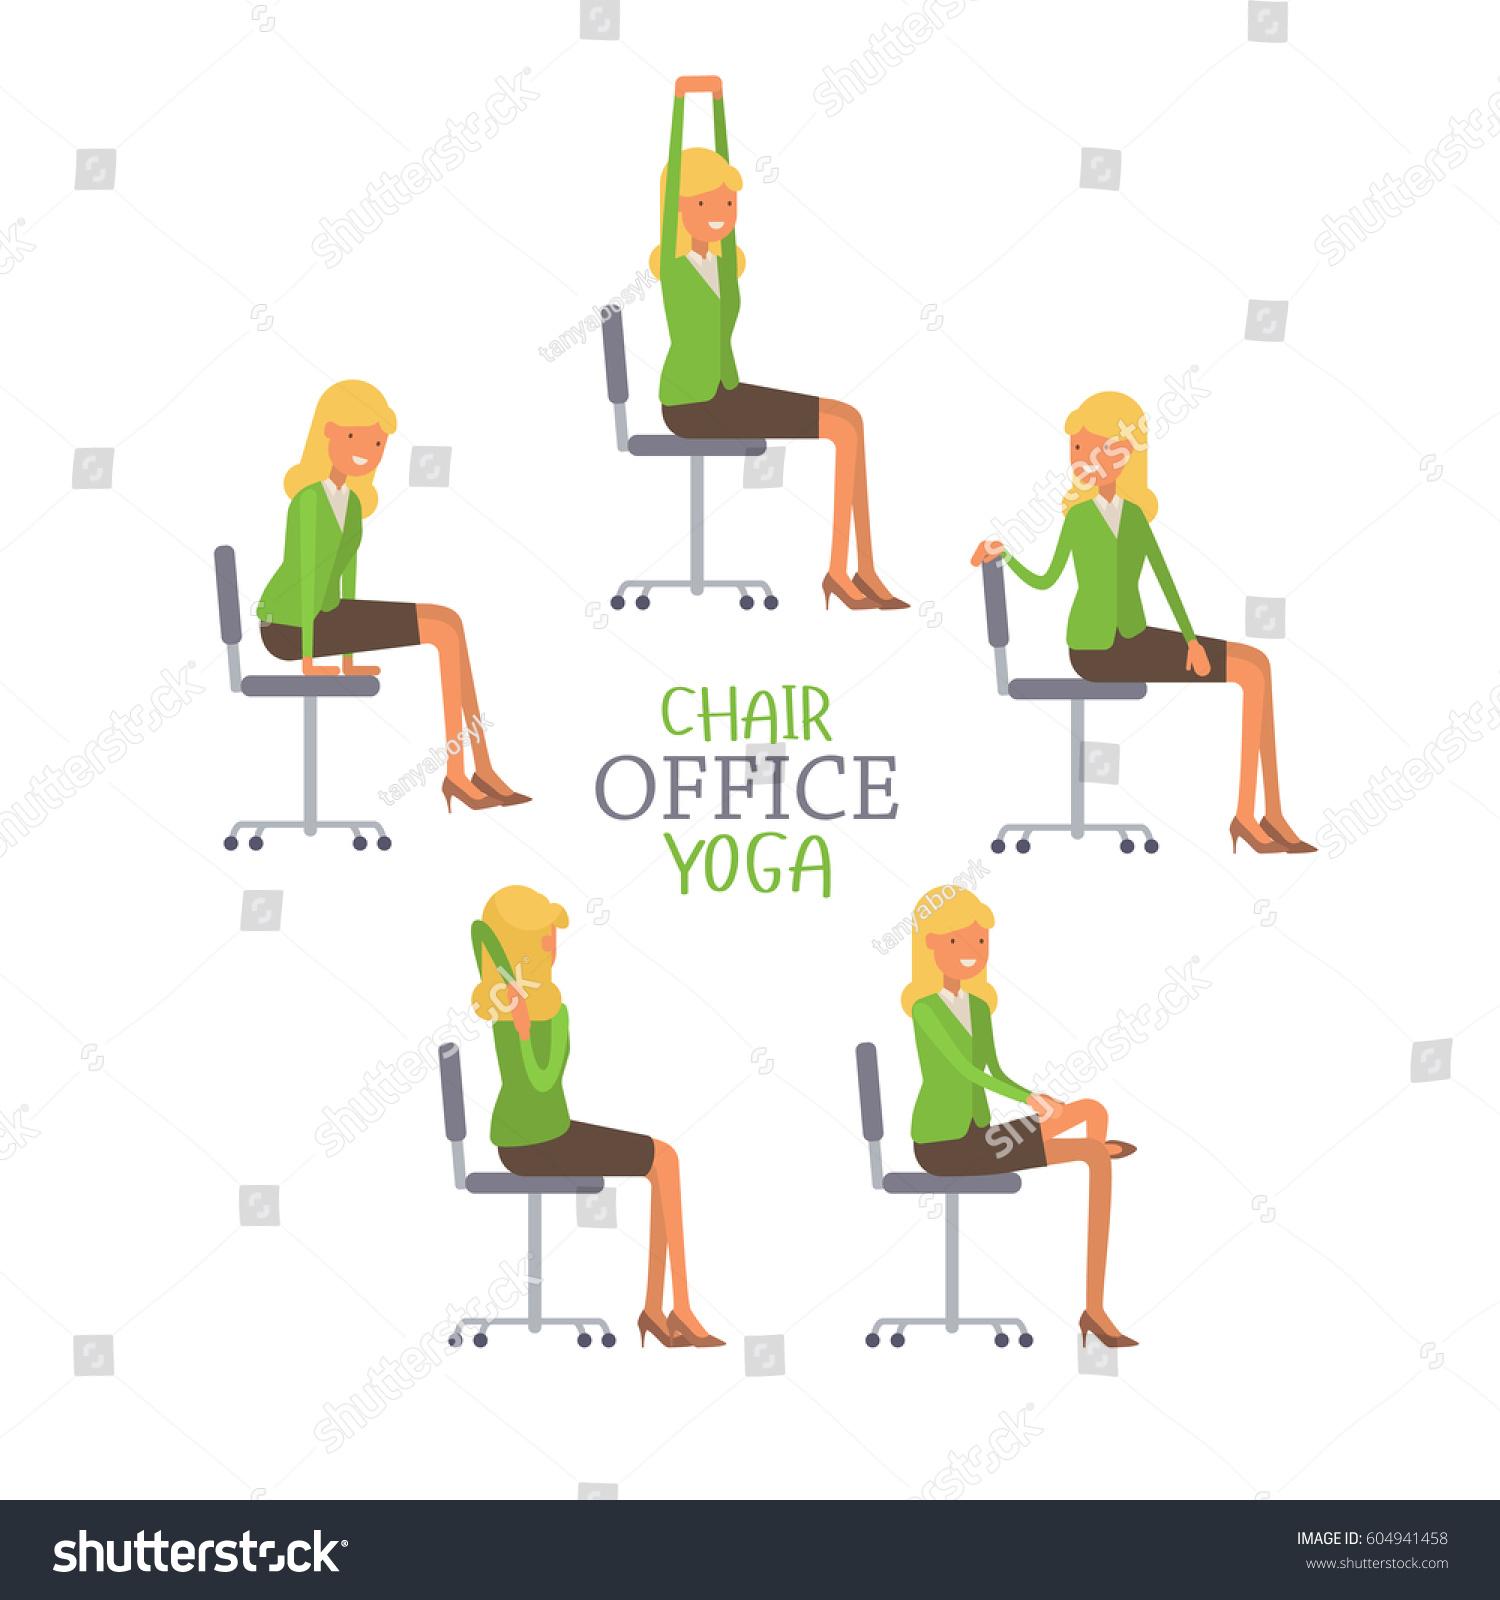 Vector Illustration fice Chair Yoga Business Stock Vector